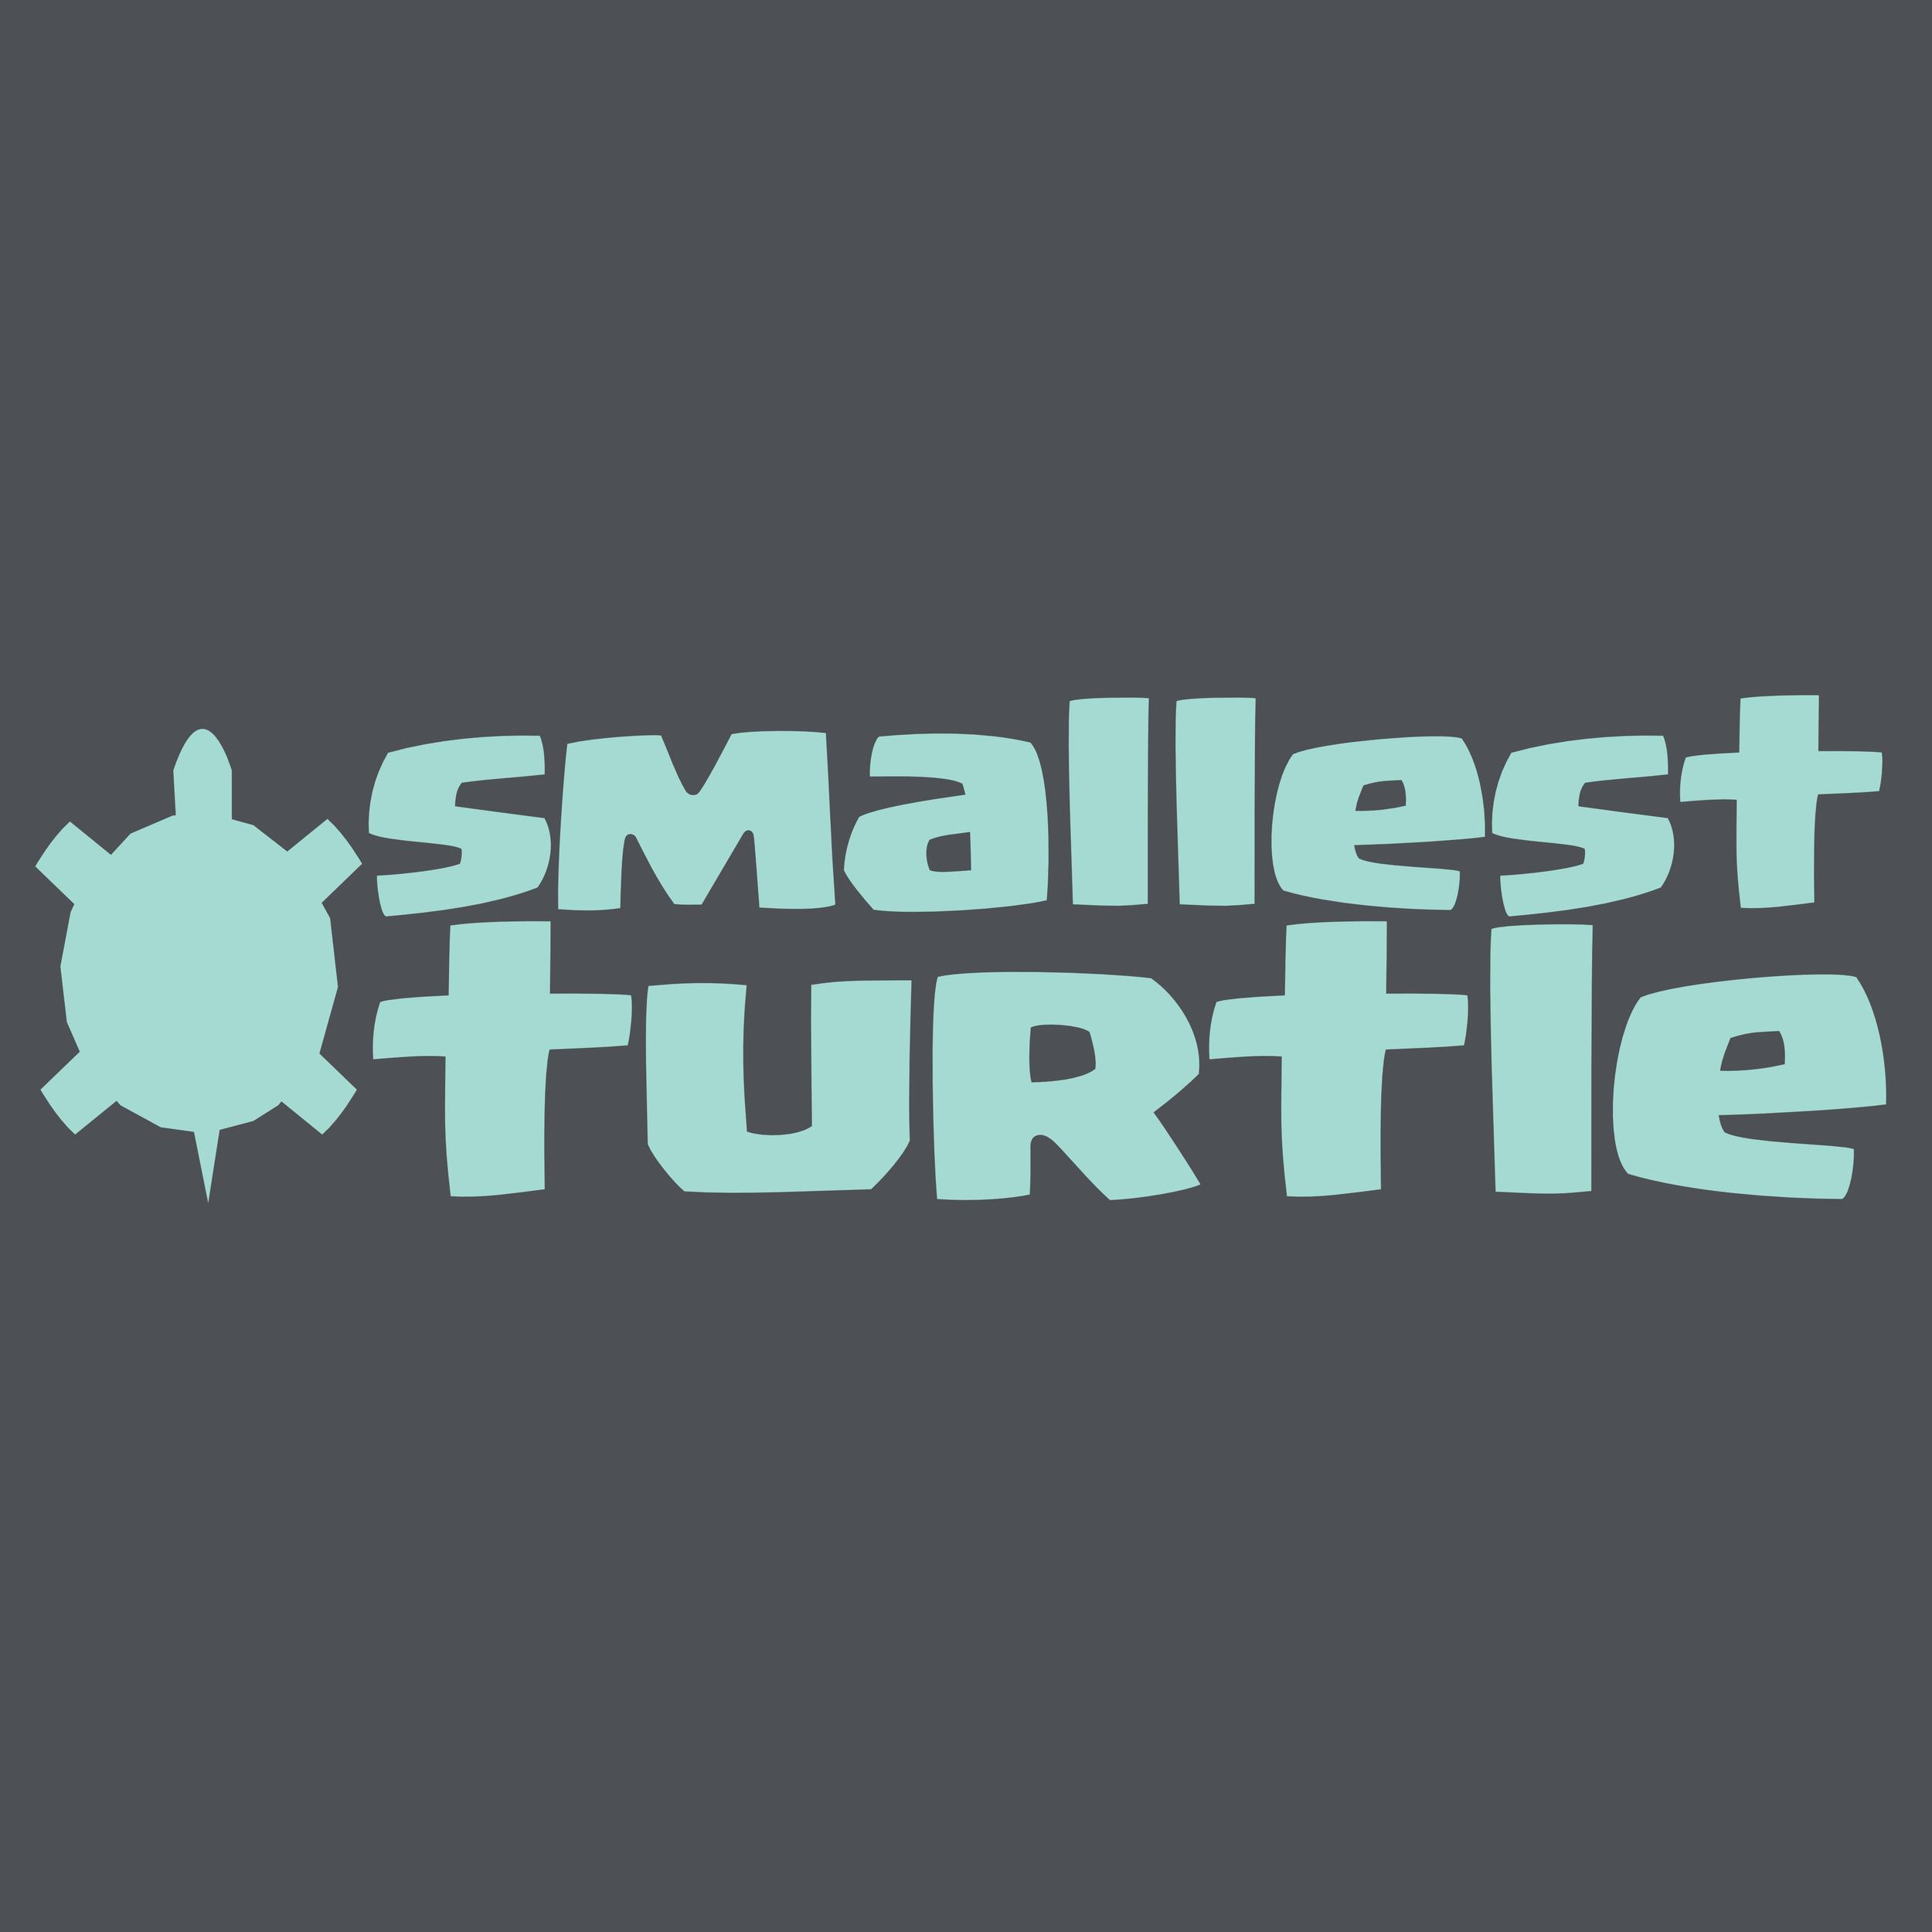 TP00021001 Smallest Turtle Logo.png